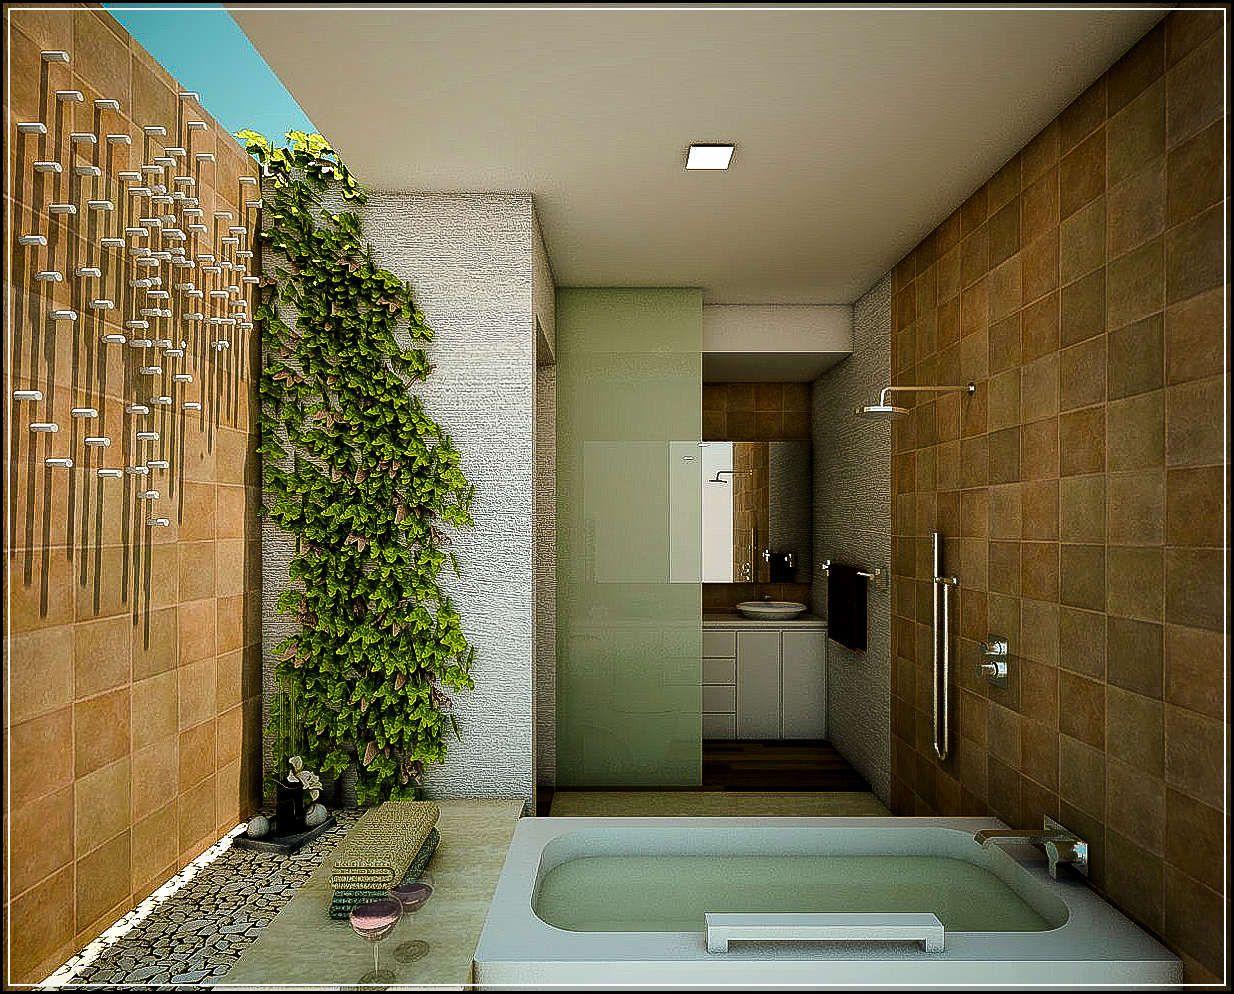 30 Desain Kamar Mandi Minimalis Nuansa Alam Dengan Batu Alam Tips Desain Interior Desain Kamar Mandi Kamar Mandi Tradisional